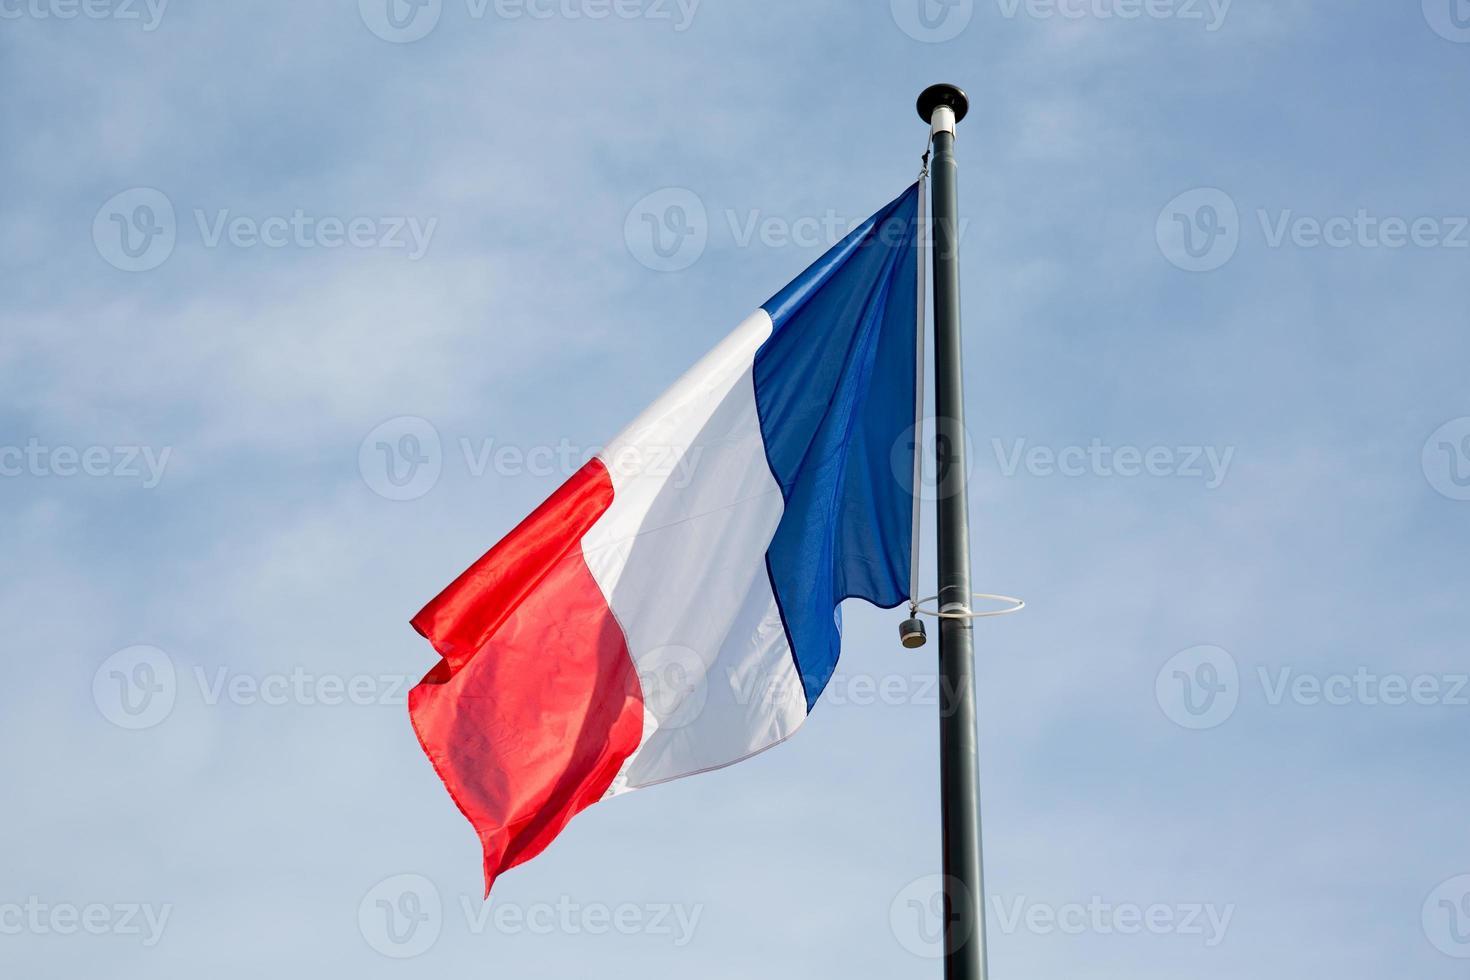 fransk flagga under blå himmel foto